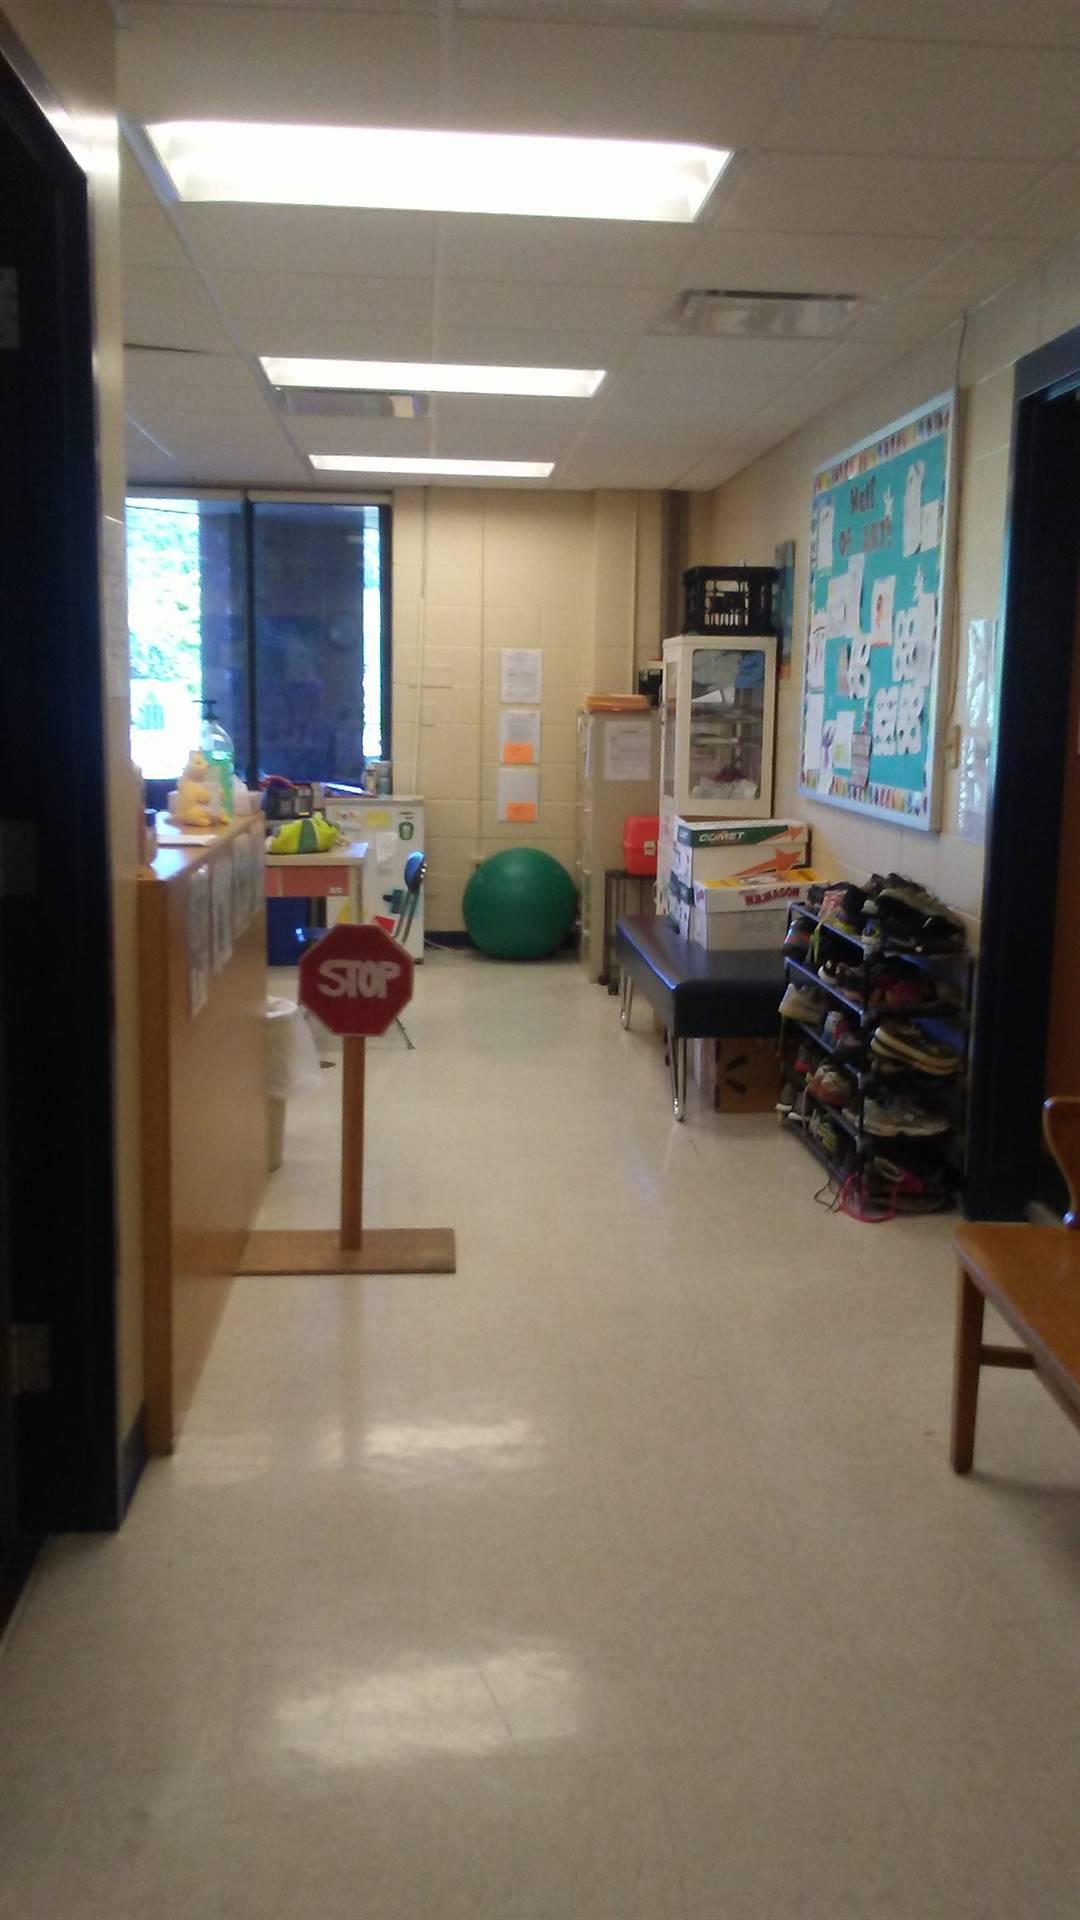 Entering the World of School Health